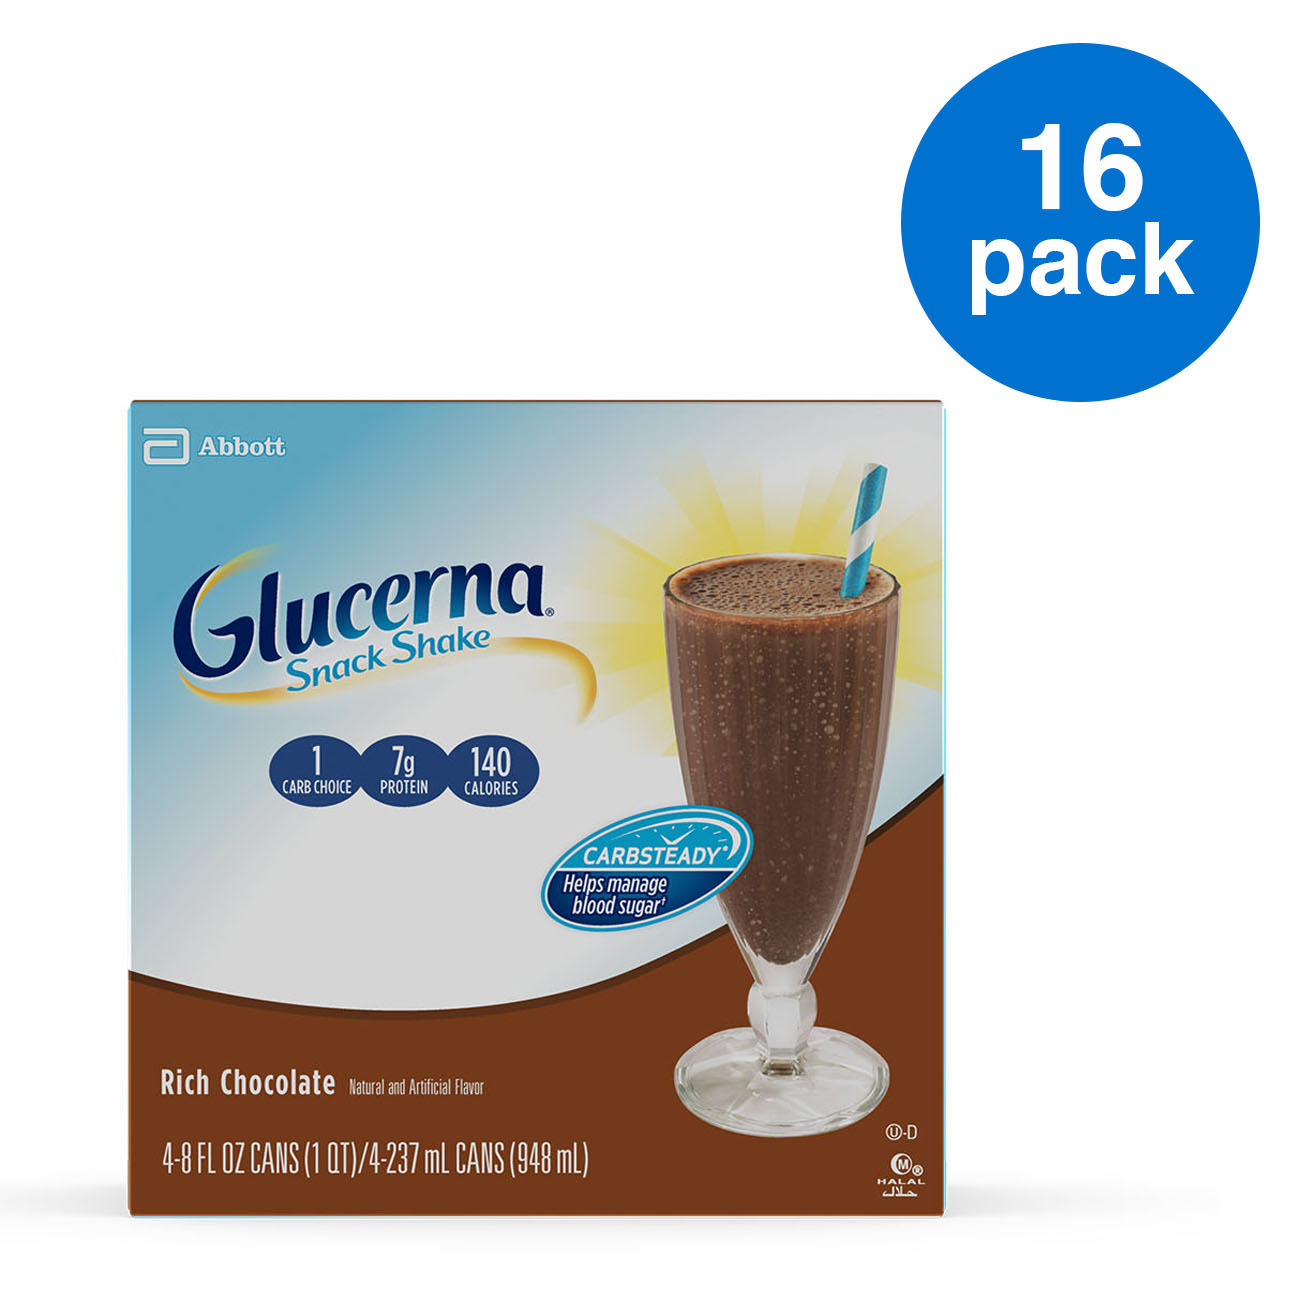 Glucerna Snack Shake, To Help Manage Blood Sugar, Rich Chocolate, 8 fl oz, 16 Count